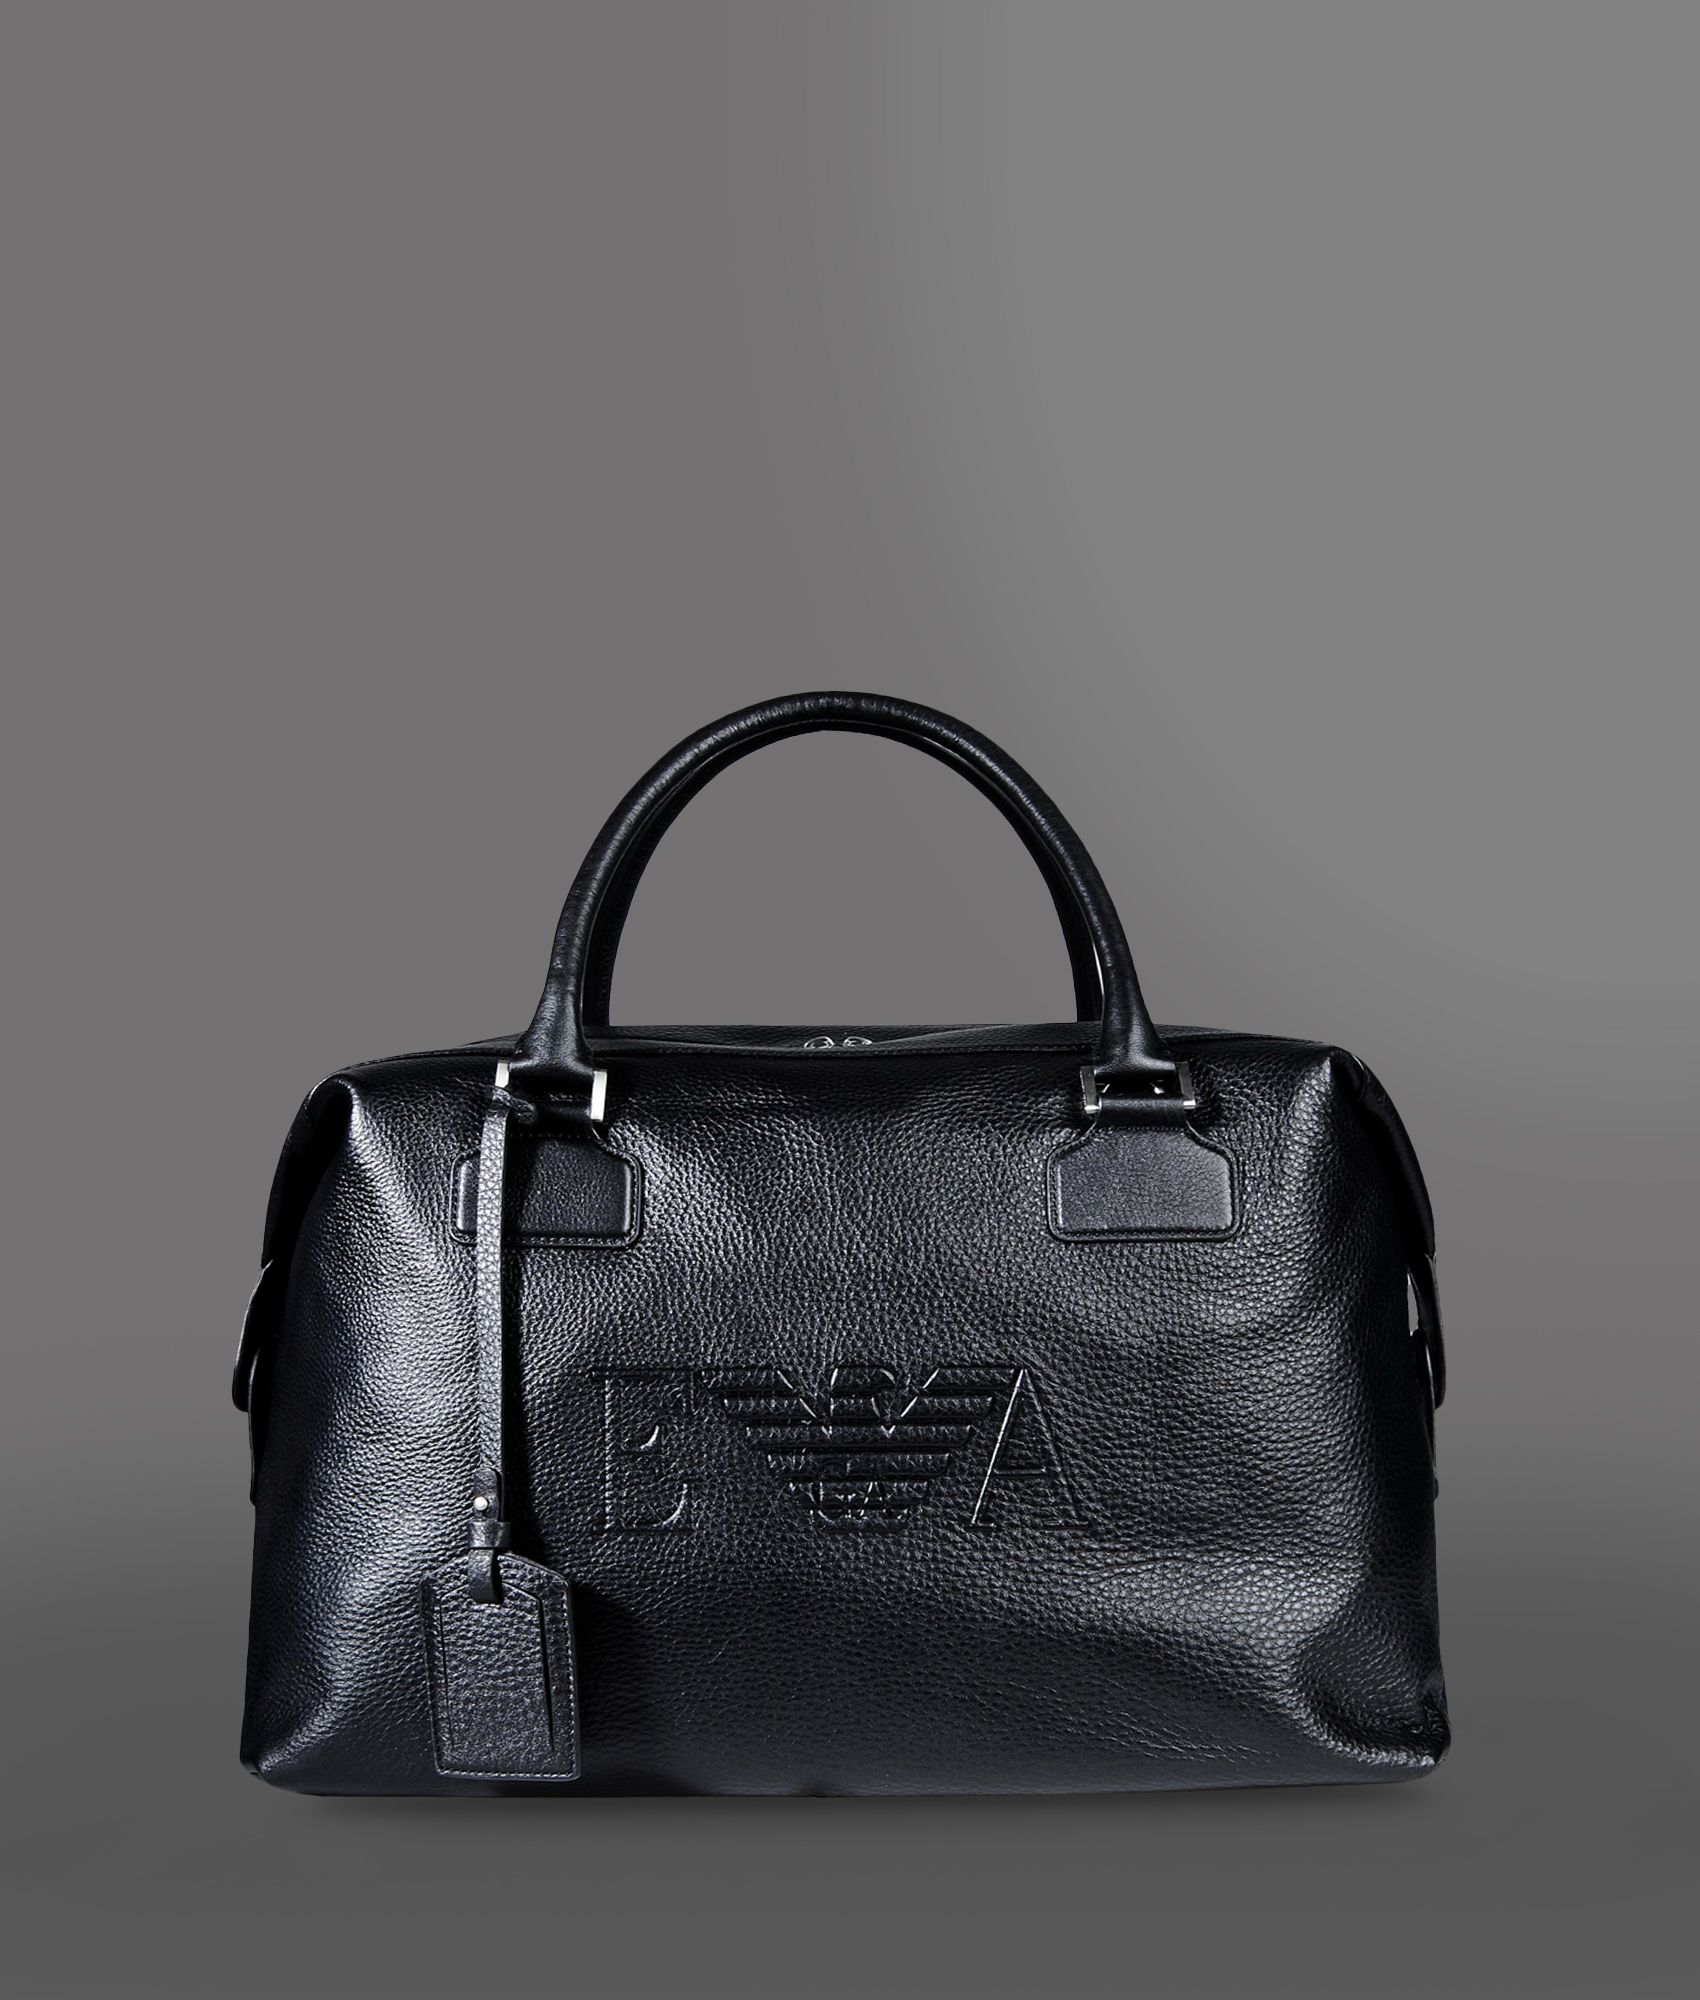 Giorgio Armani Bags Uk Style Guru Fashion Glitz